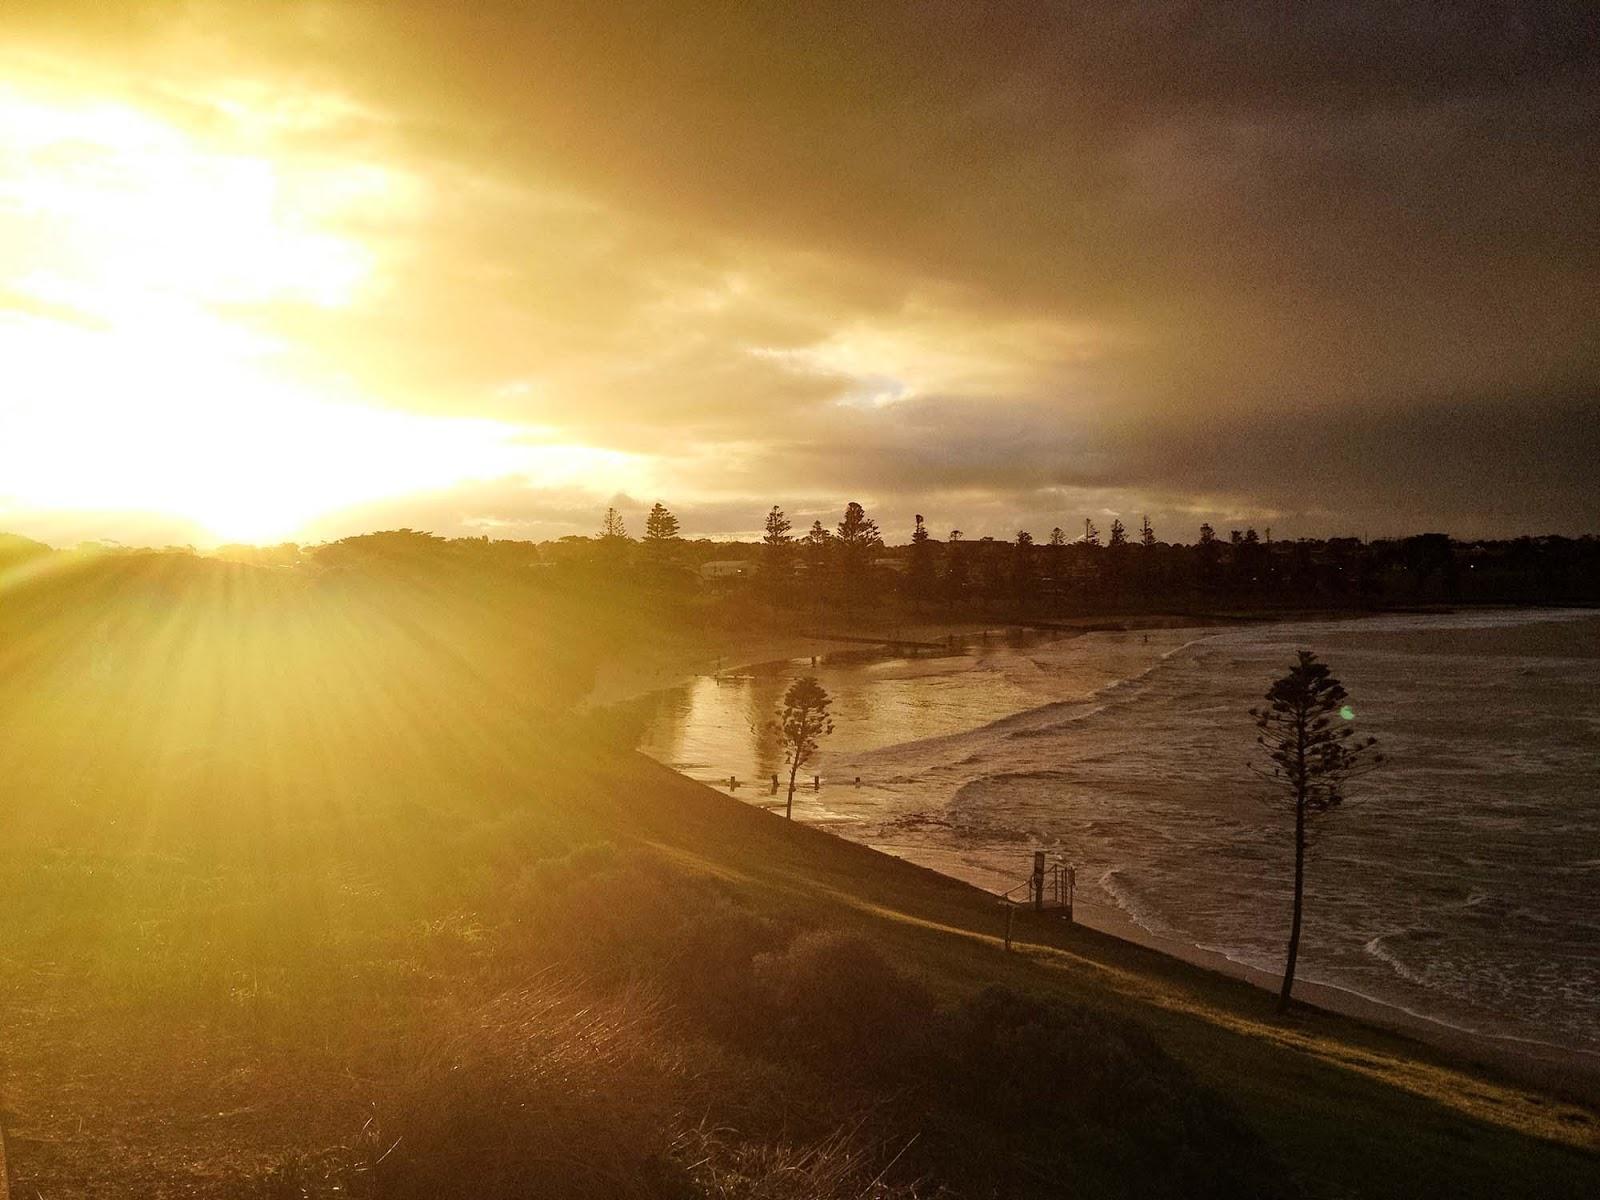 torquay beach at sunset